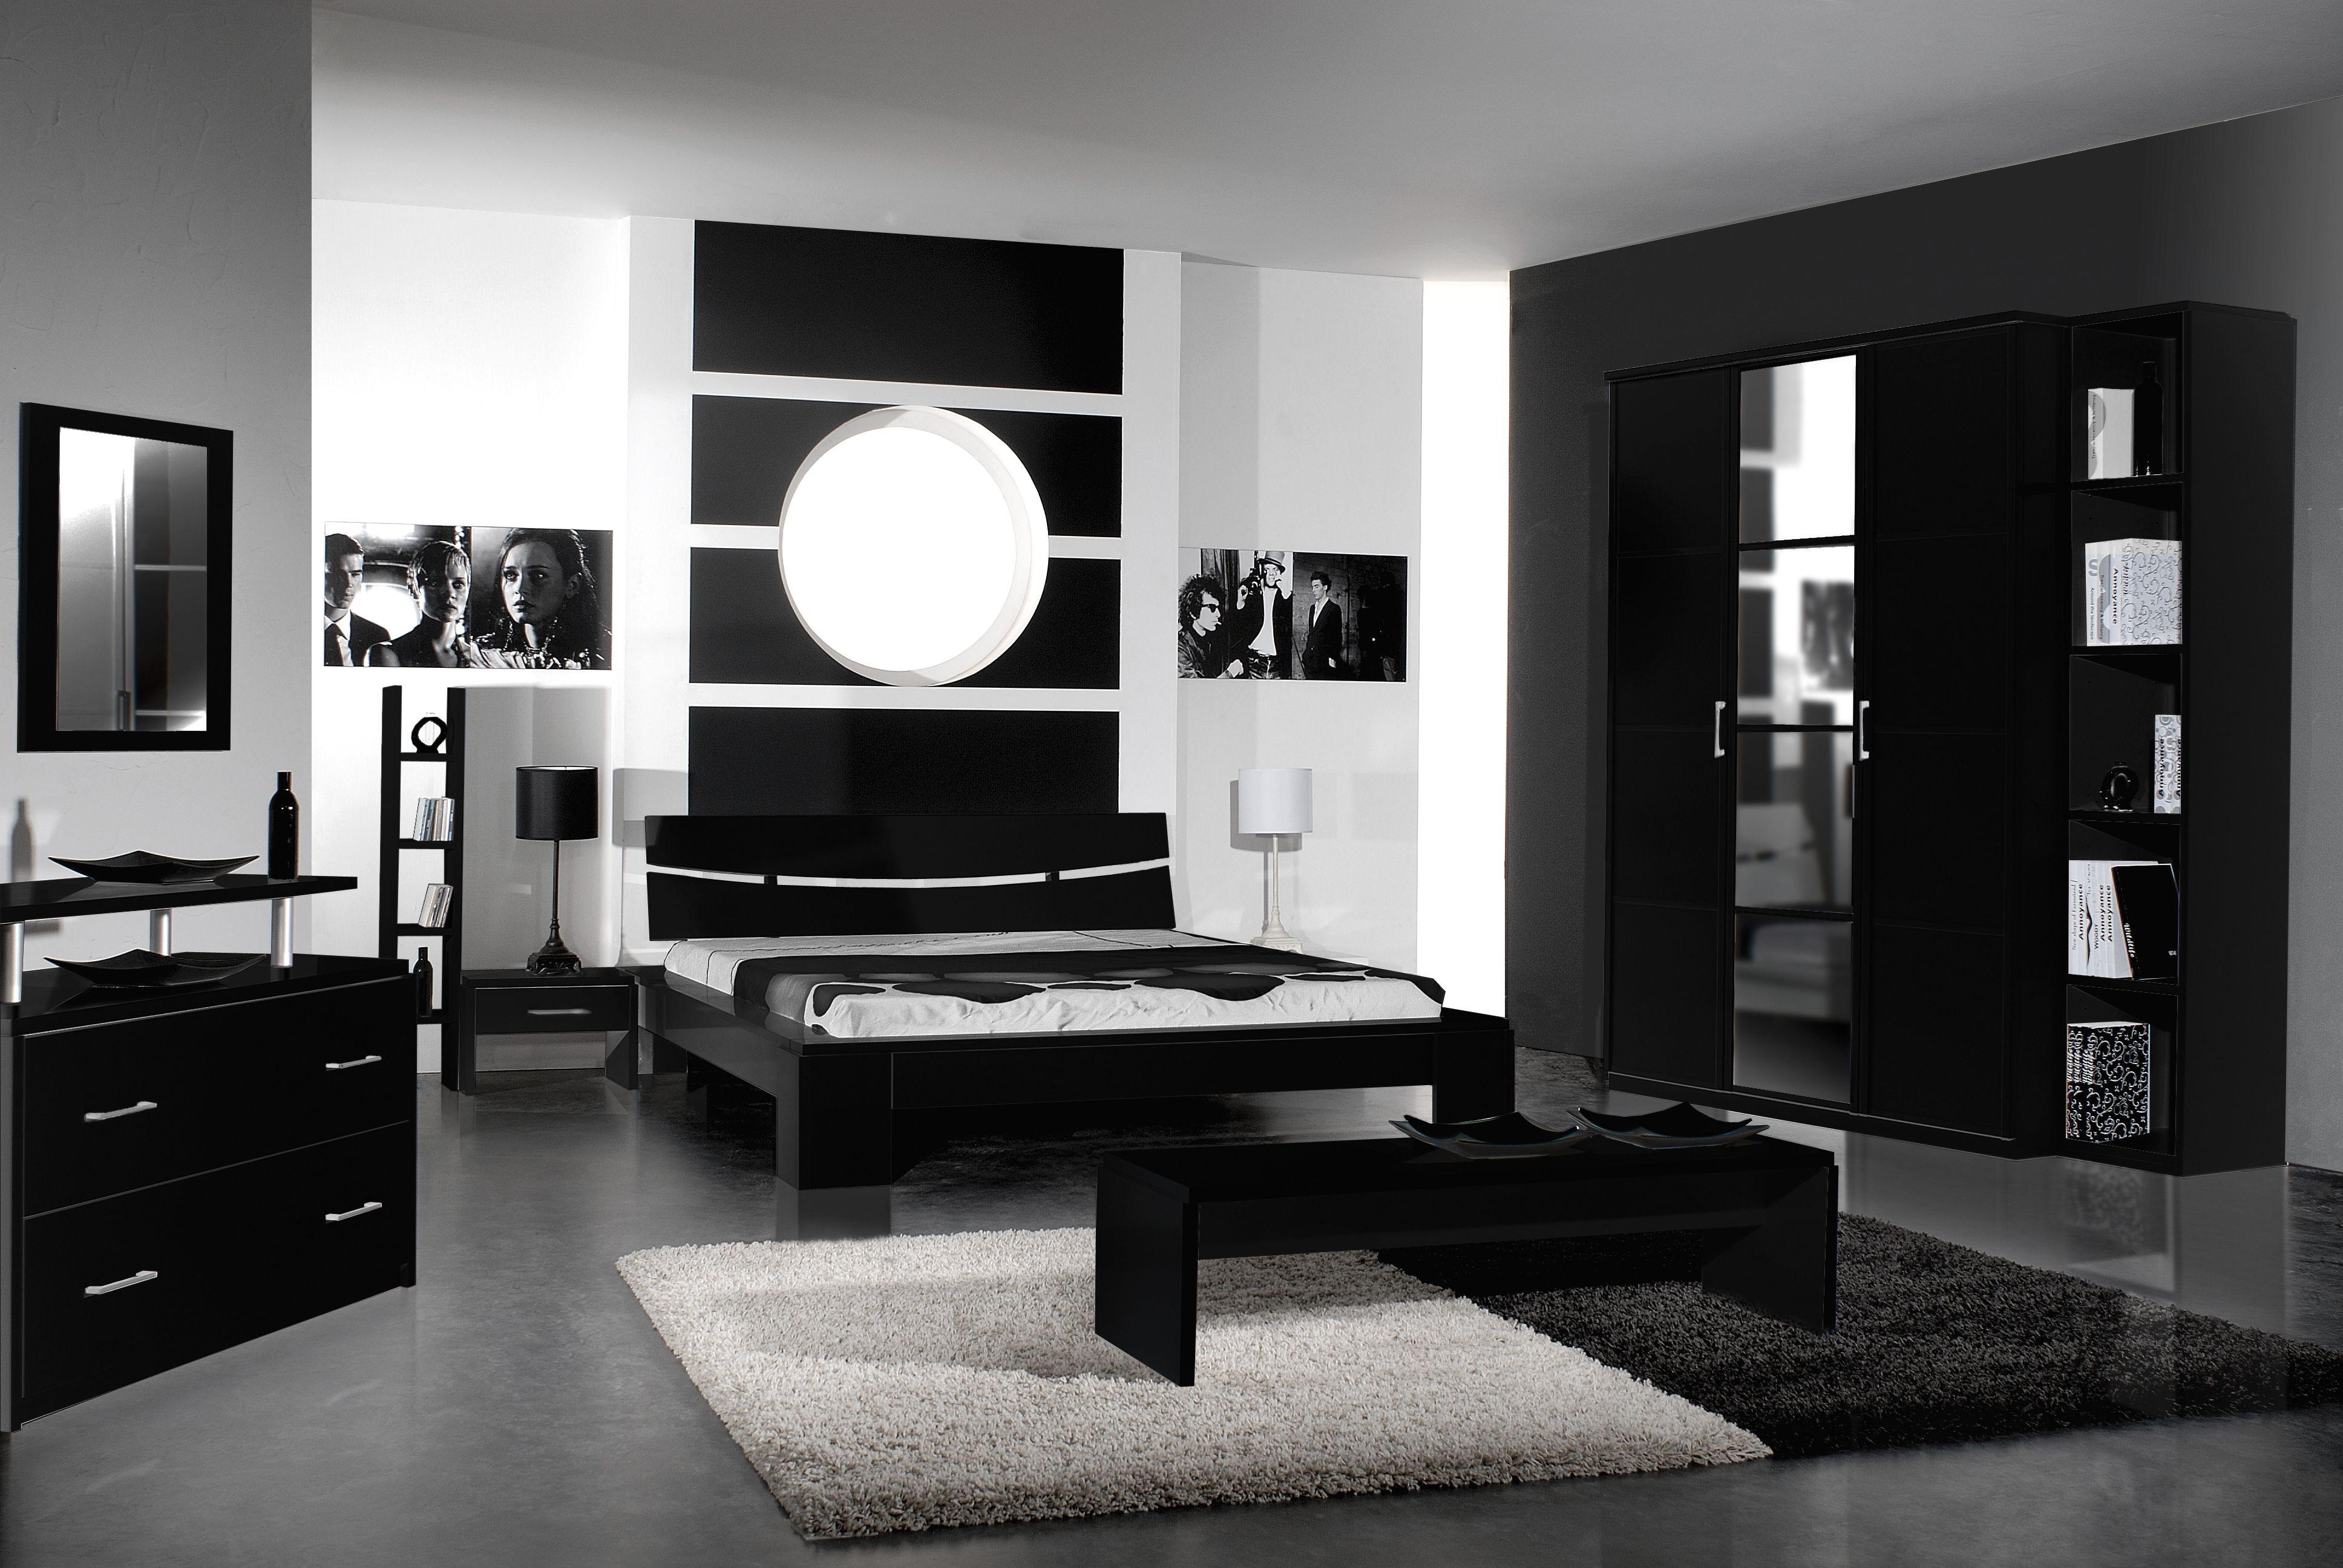 Merveilleux Collections Sciae Bedroom Modern Furniture France Zen 38 Bedroom Bedroom  Furniture Stores Bedroom Picture Bedroom Furniture Stores Efhpg Modern Decor   ...